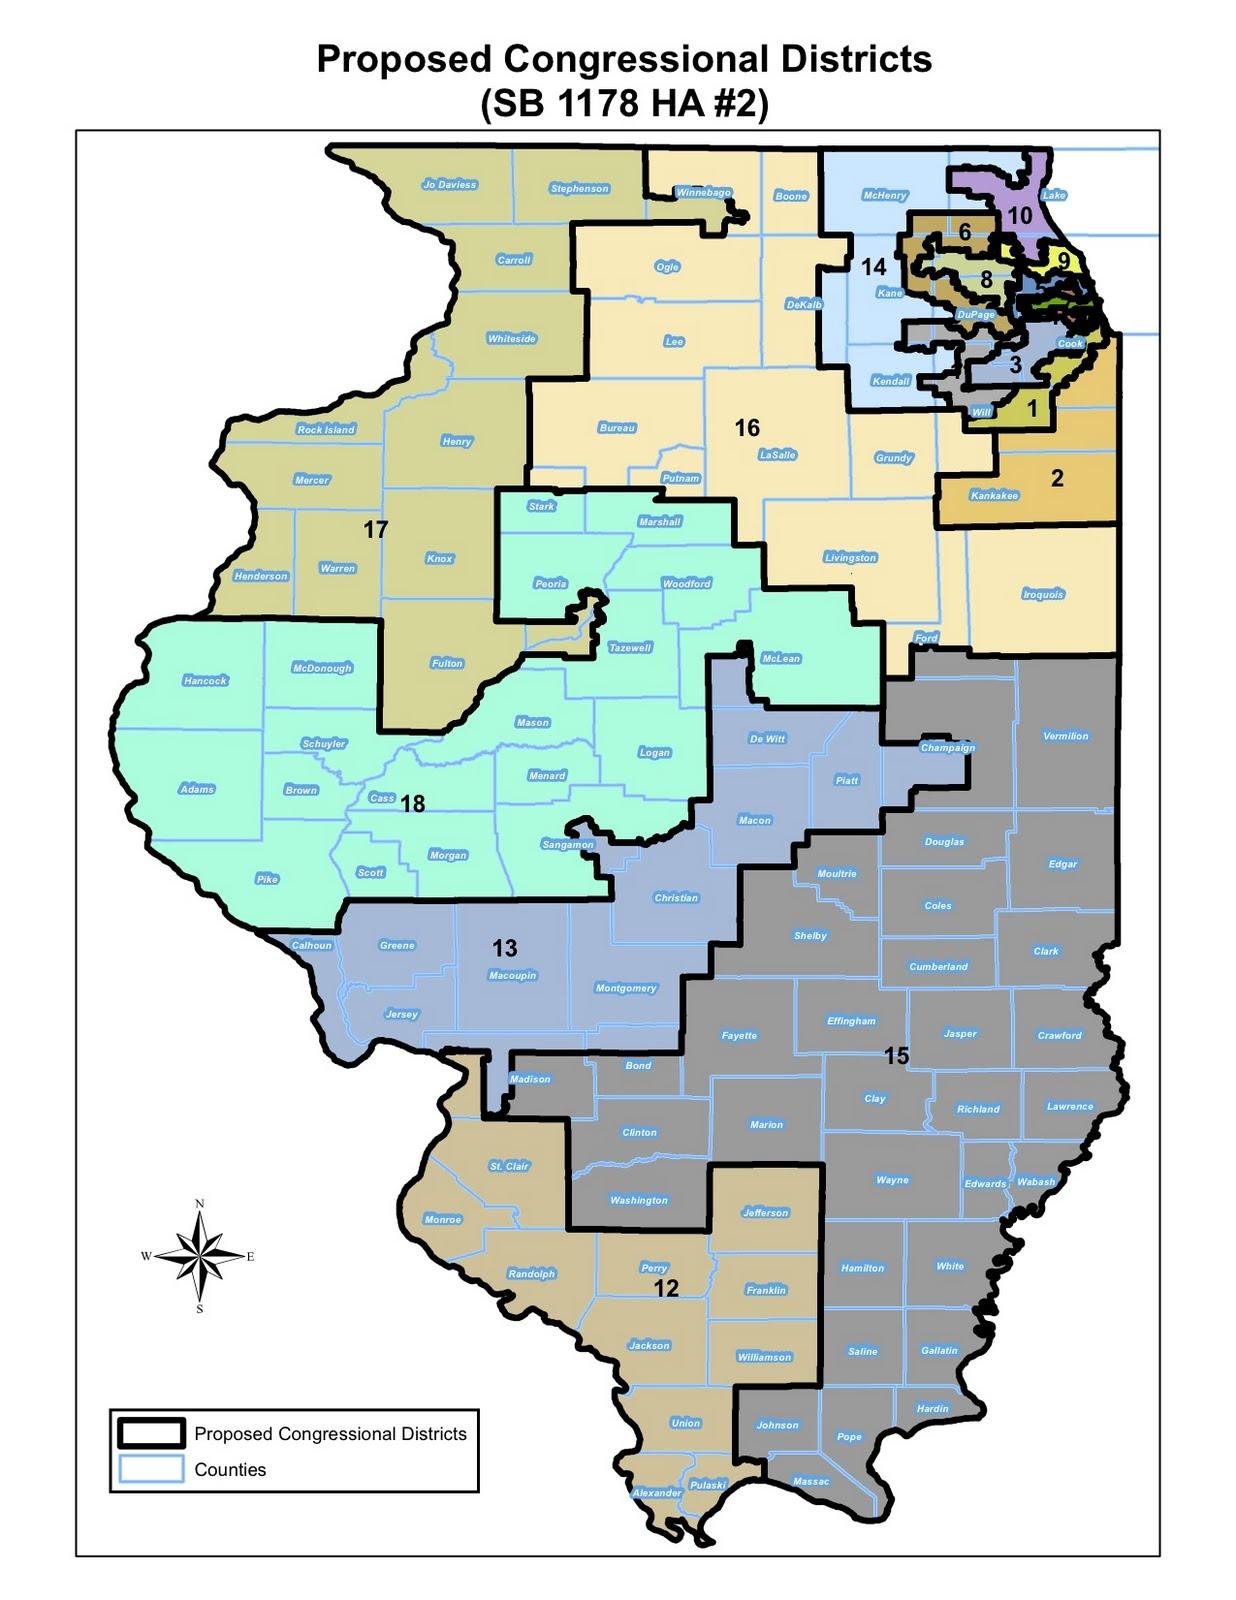 ILLINOIZE Illinois new legislative maps face legal challenges